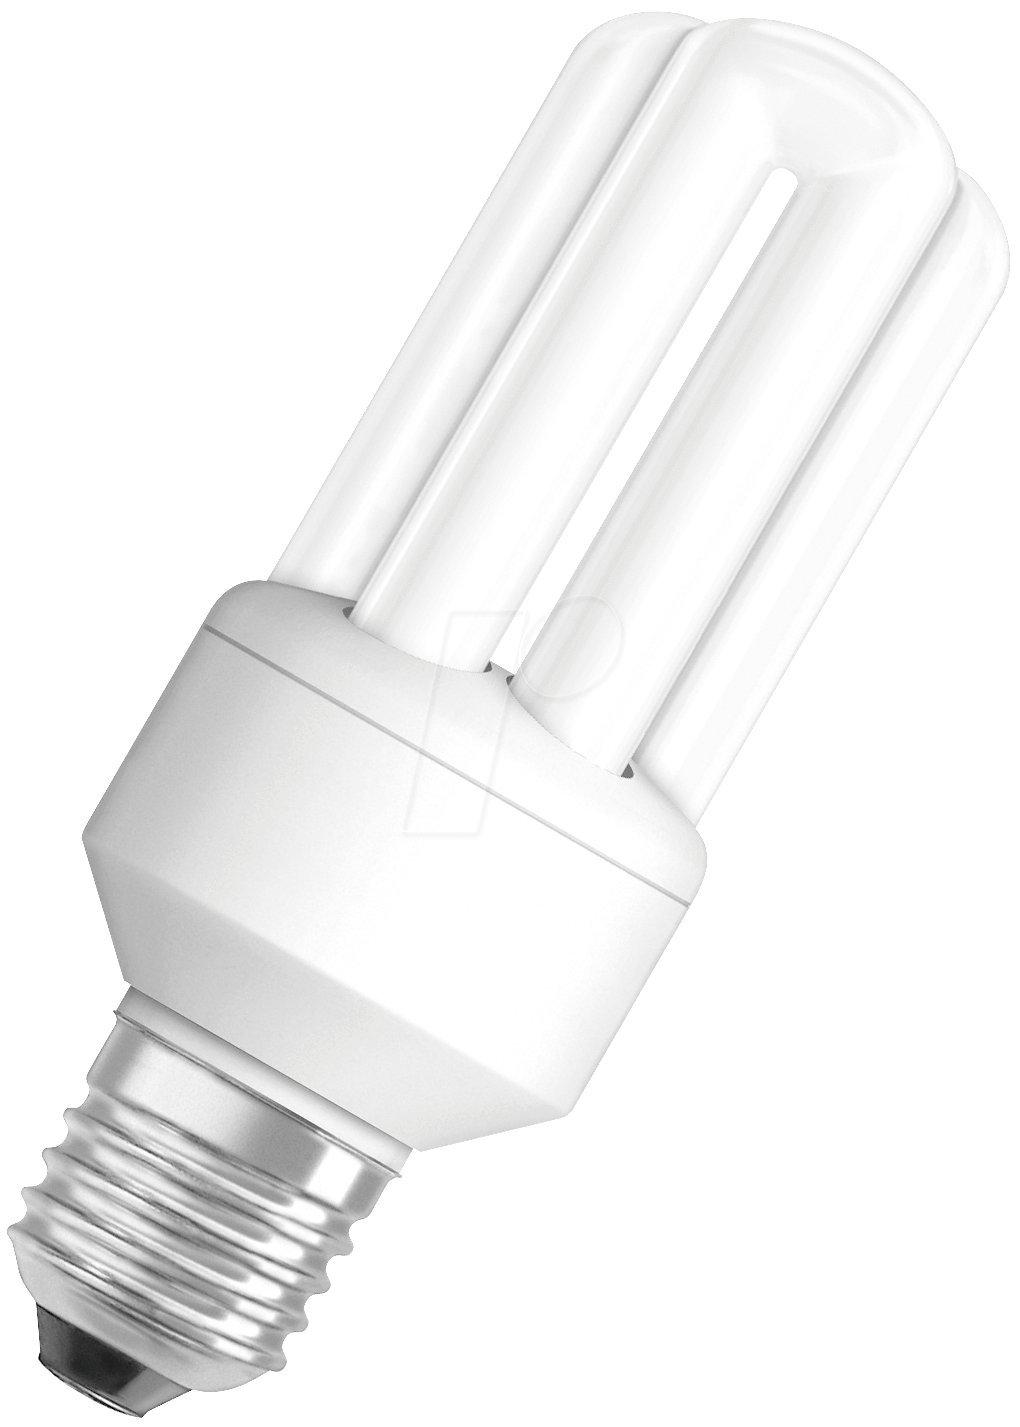 Osram Duluxstar Stick Bombilla de bajo Consumo de Forma Lineal E27, 11 W, Color Blanco 2051661